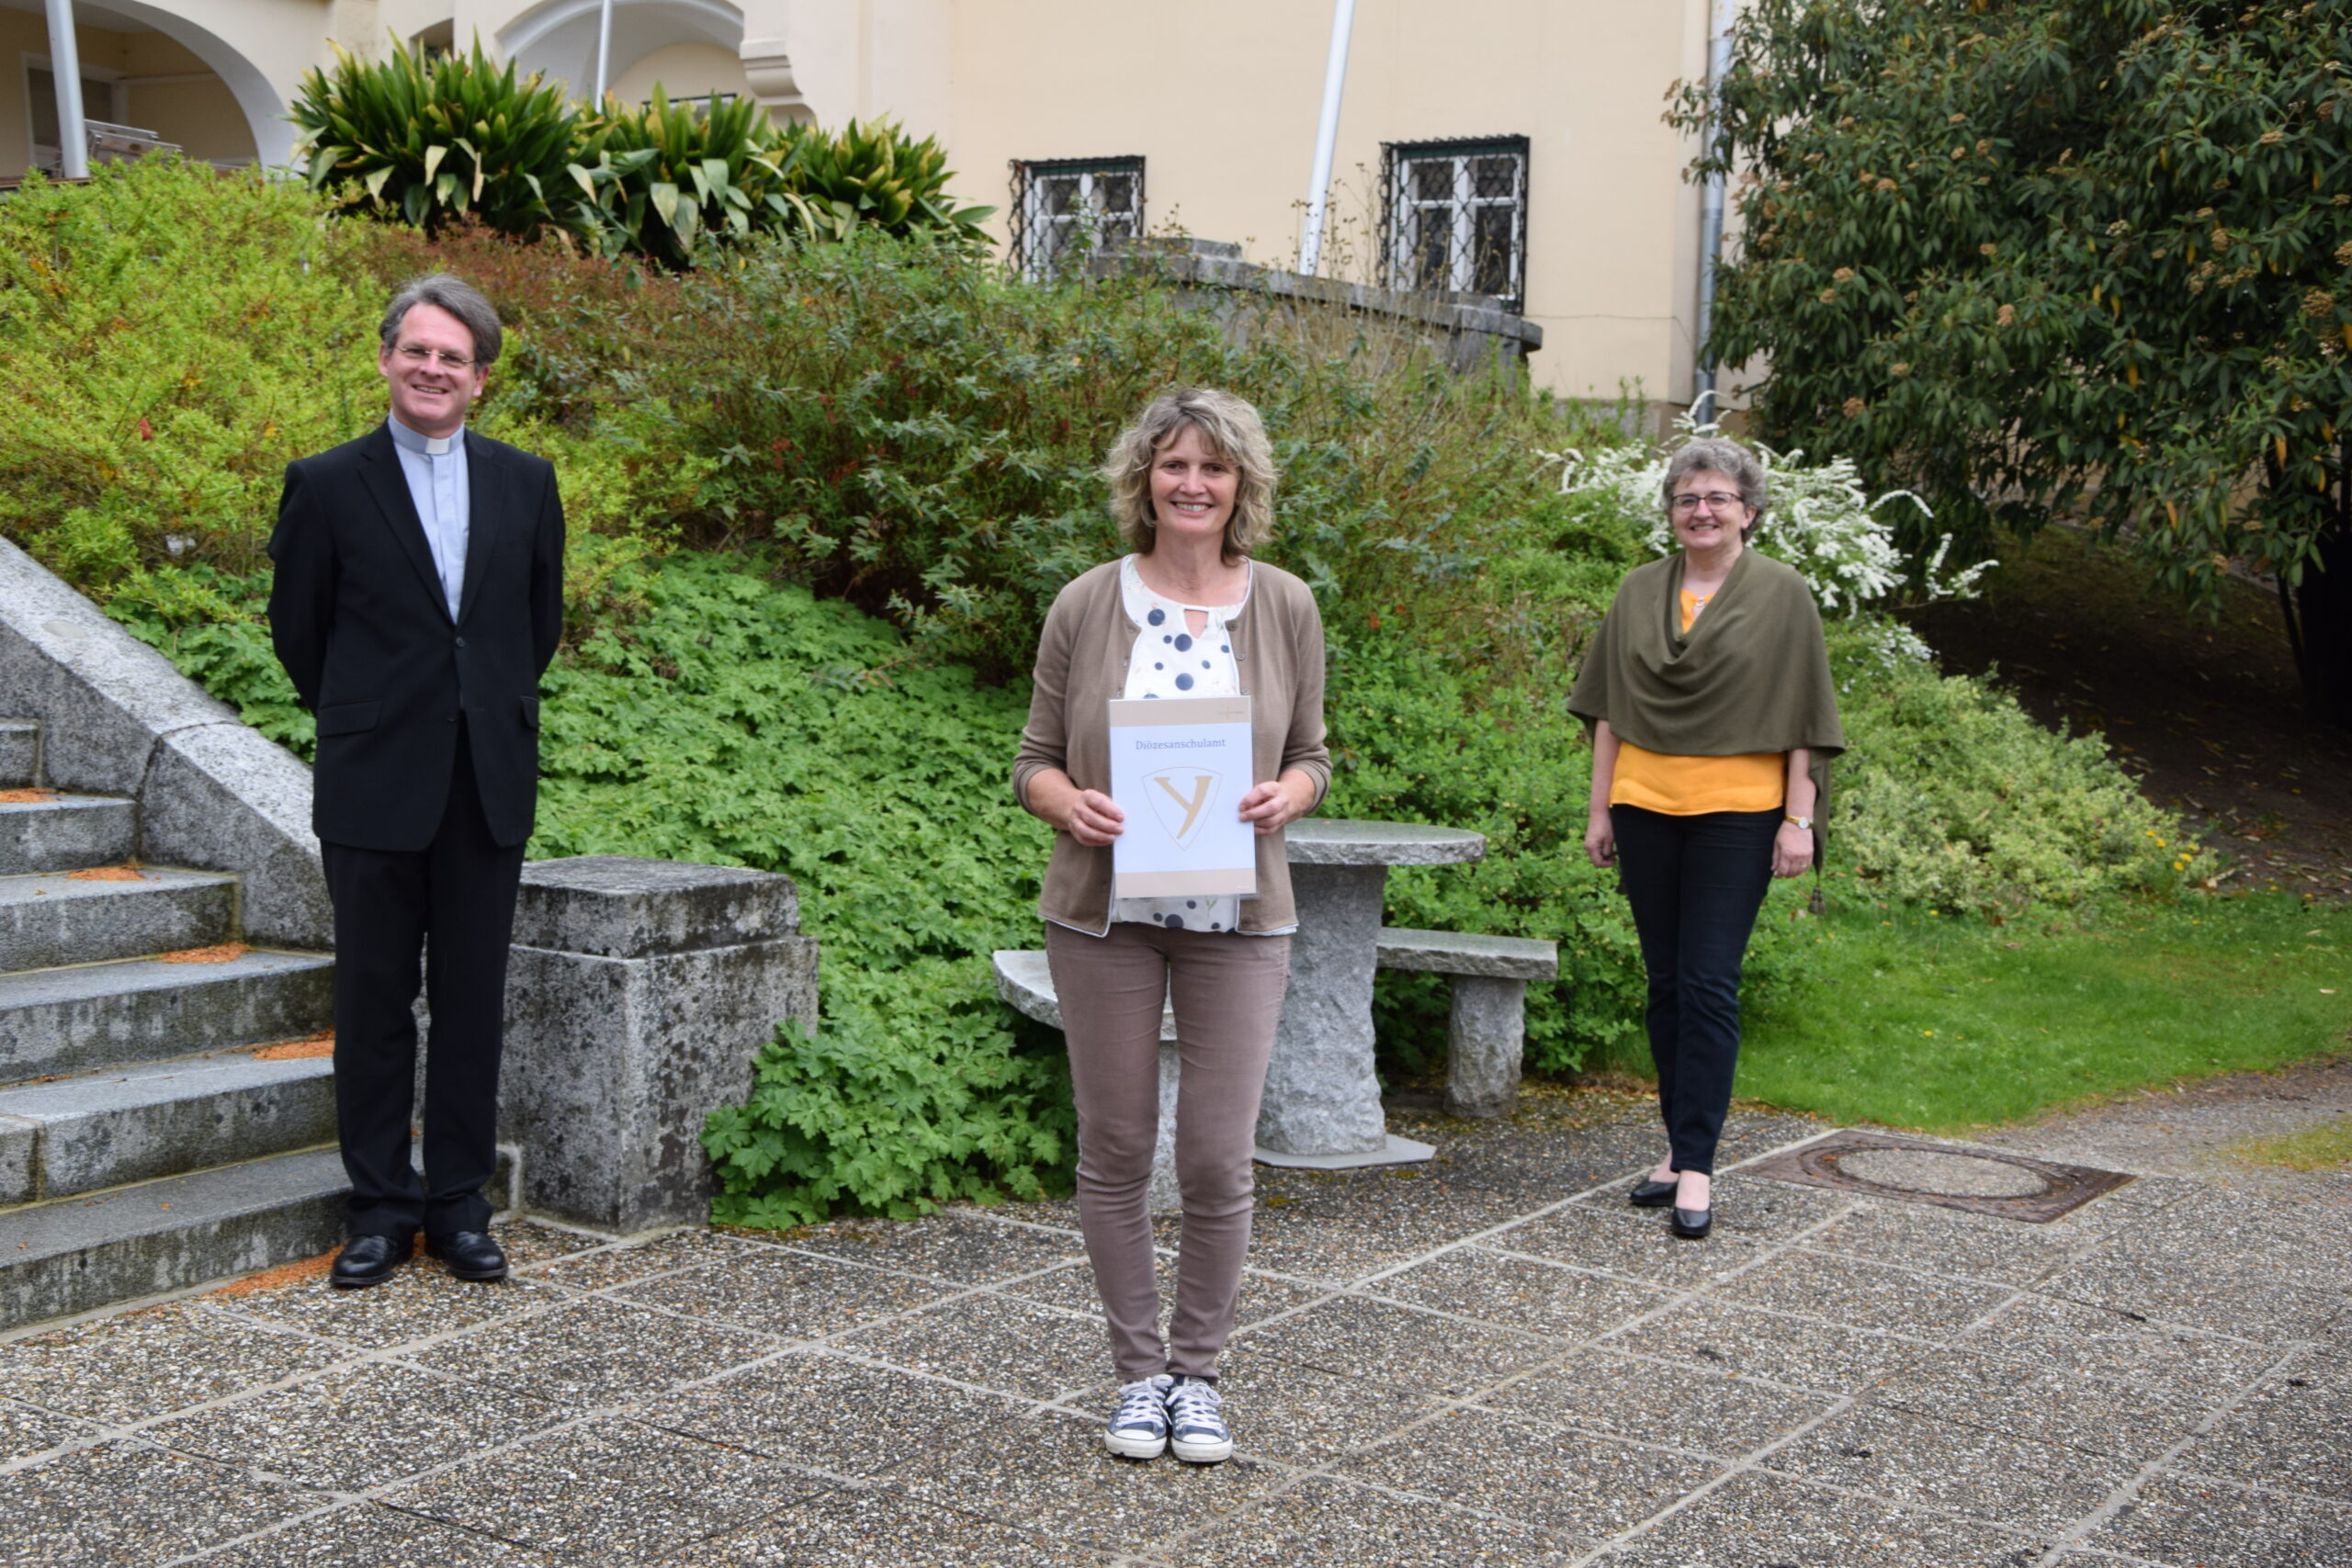 Fachinspektor Pirmin Mayer, Fachlehrerin Maria Wieder, Direktorin Rosina Neuhold